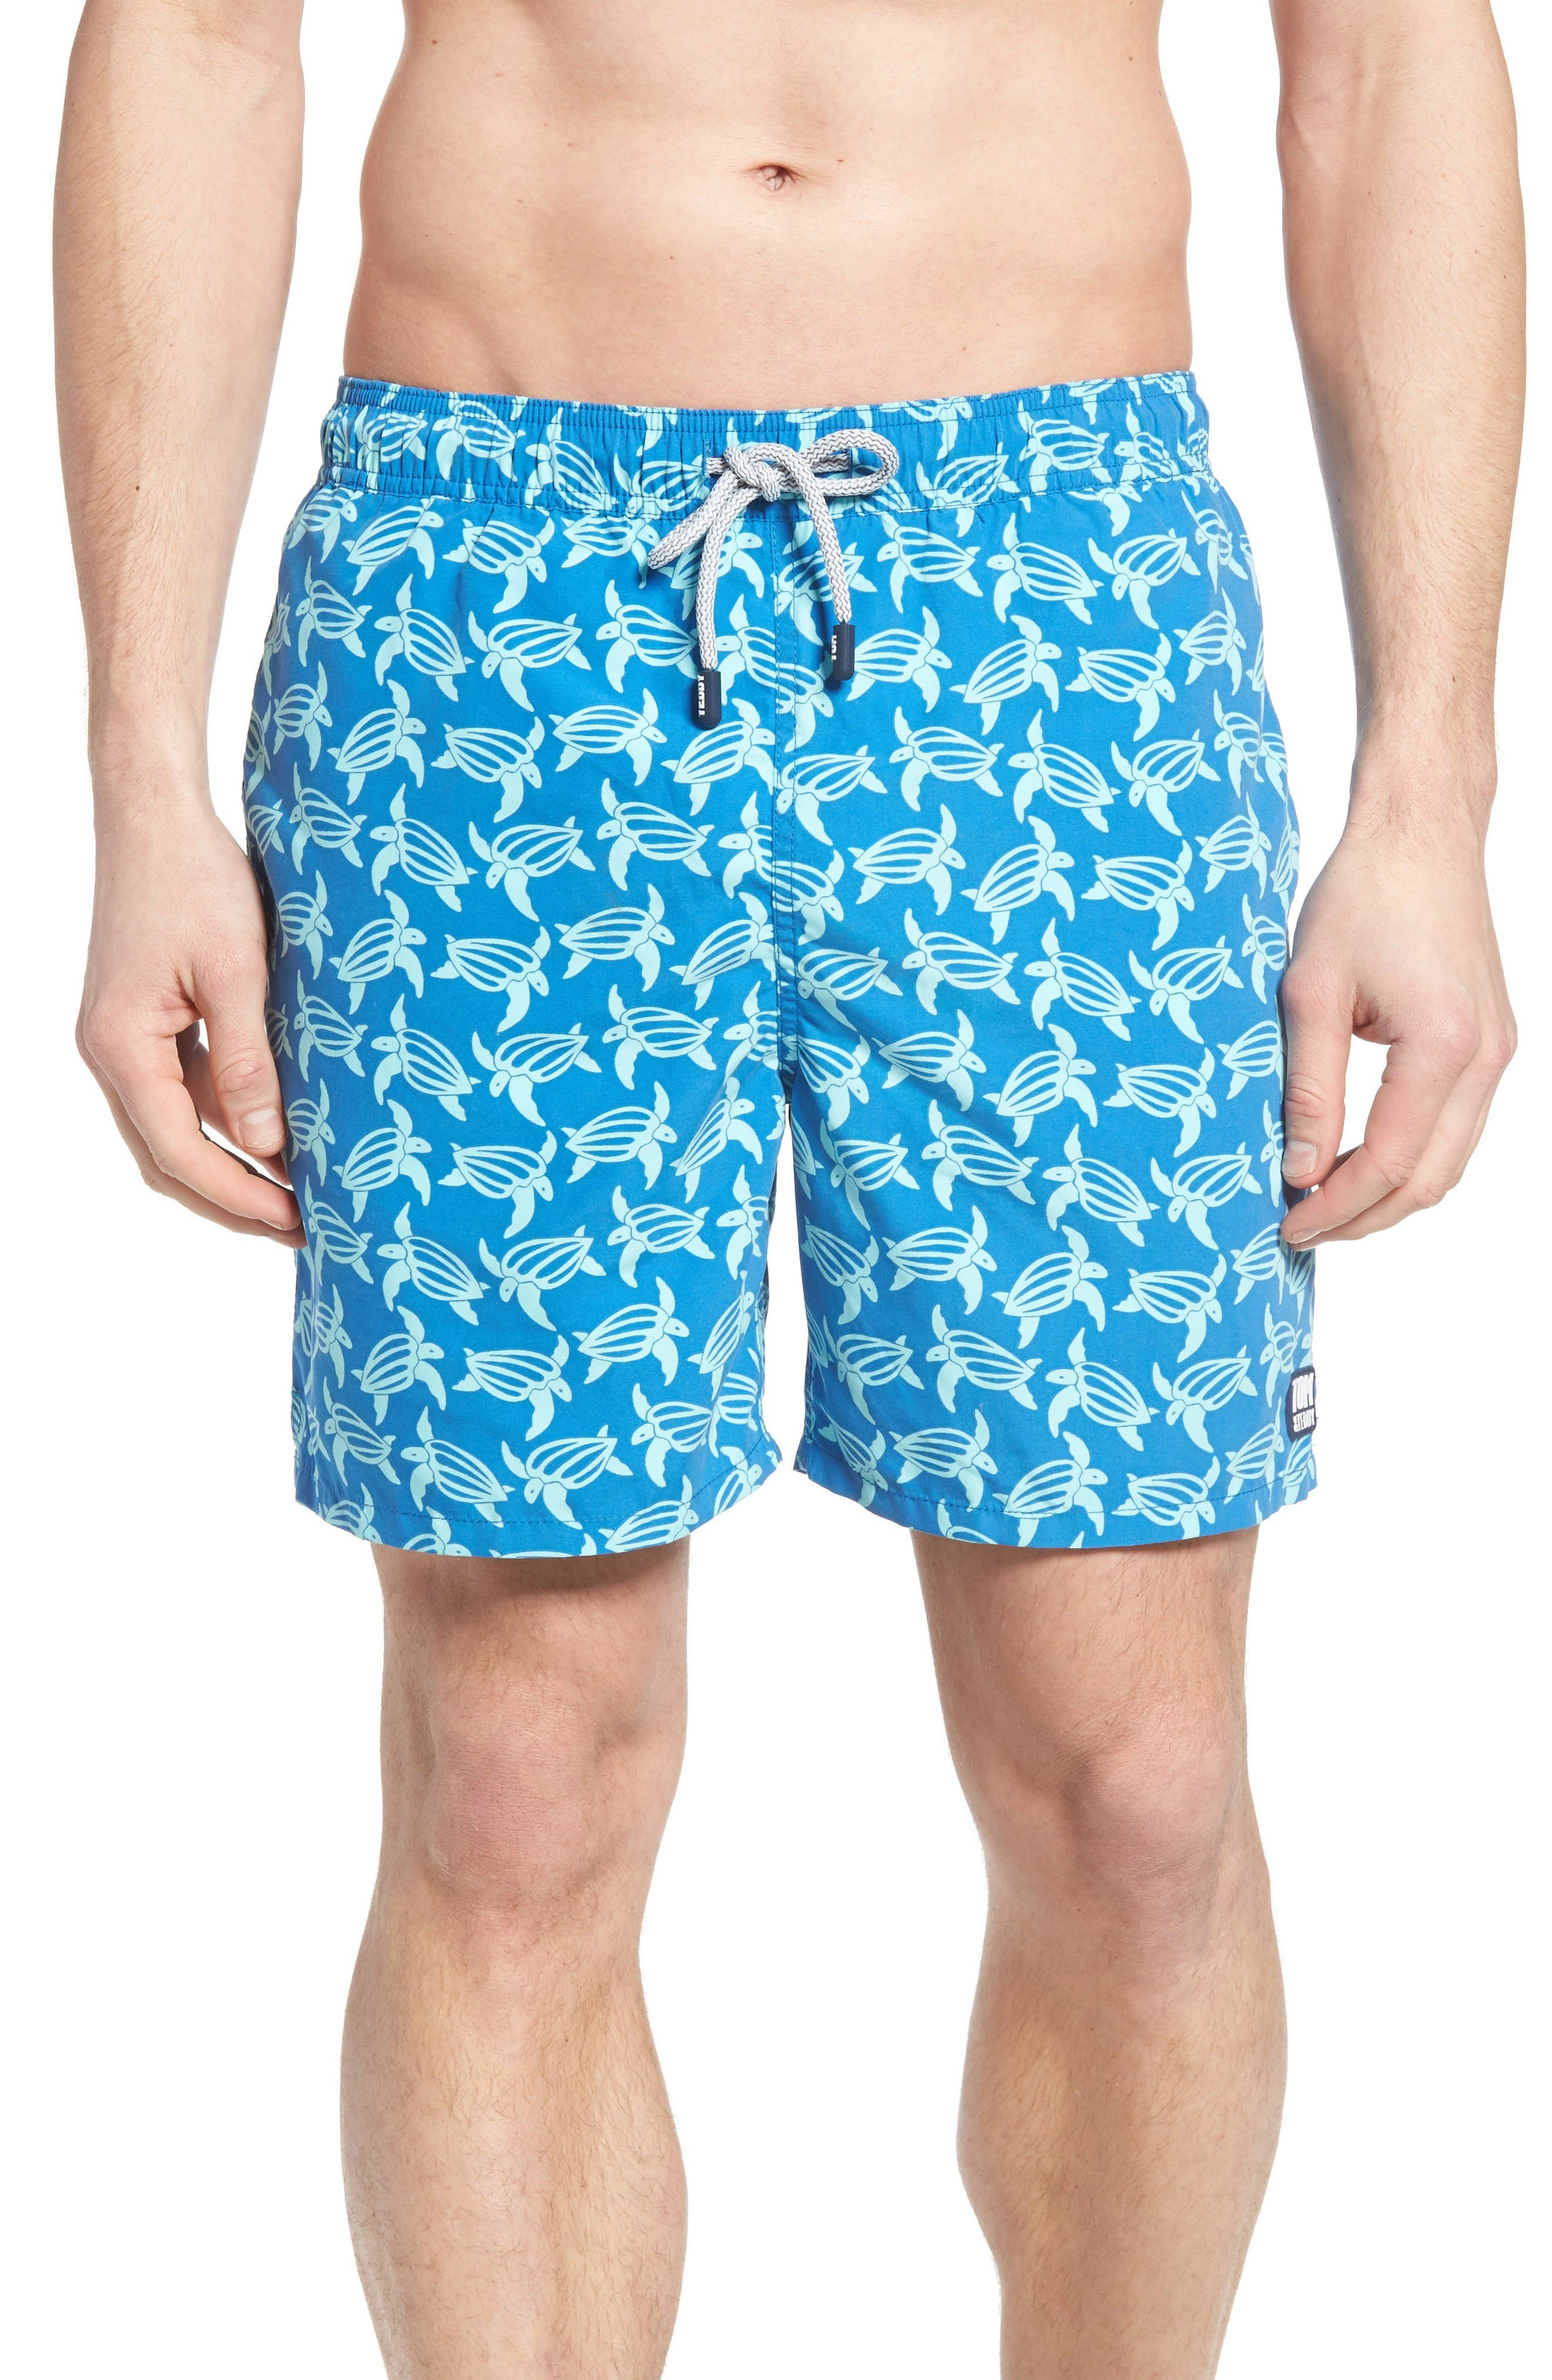 Alternate Image 1 Selected - Tom & Teddy Turtle Print Swim Trunks